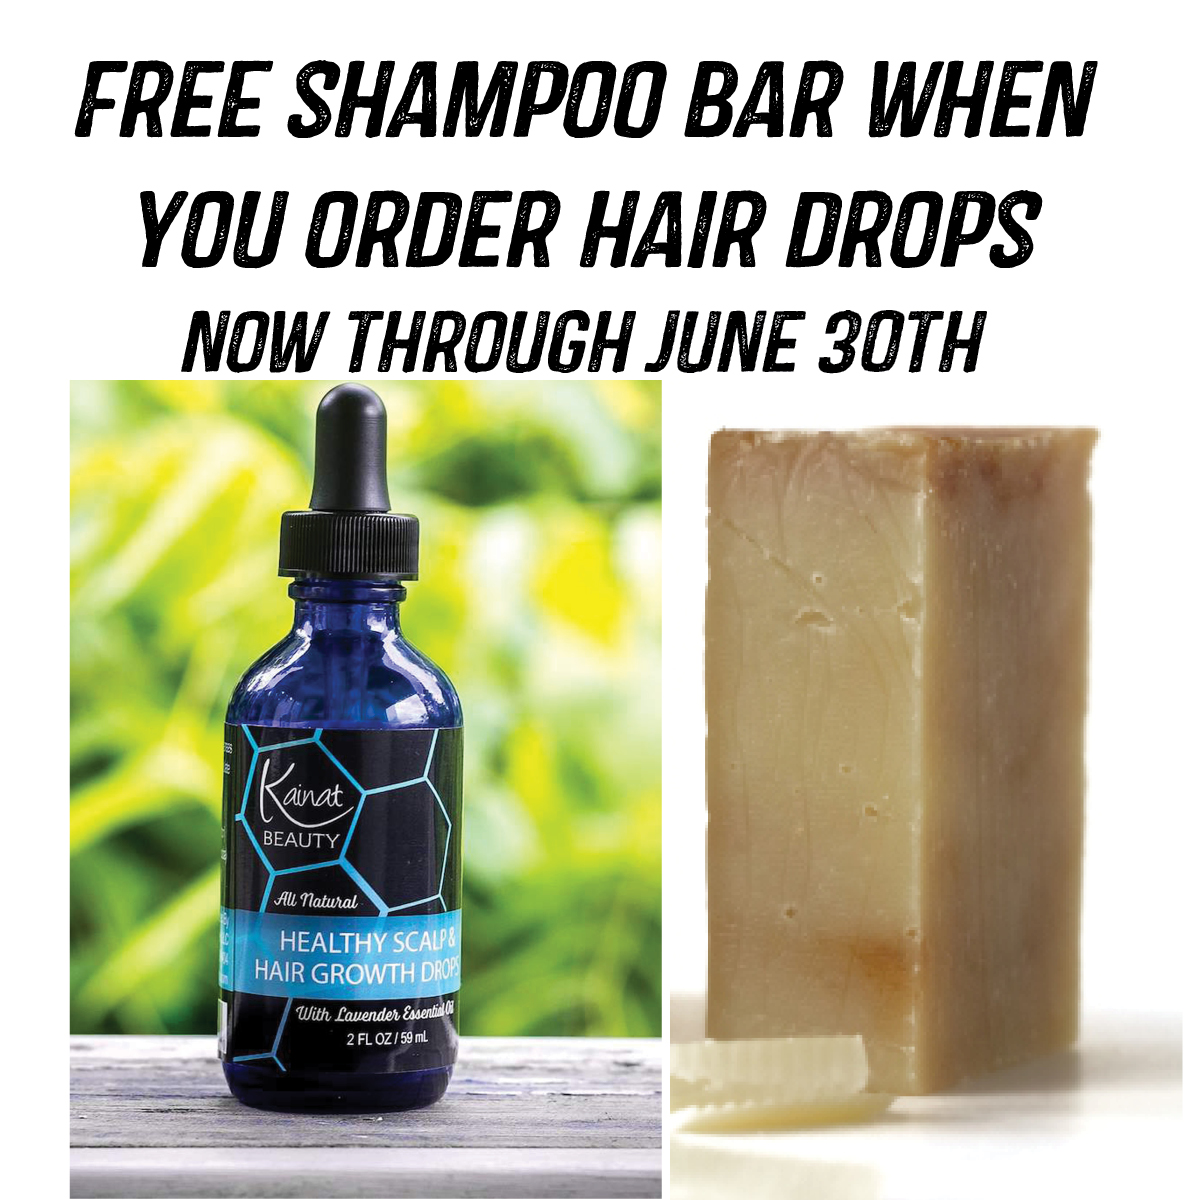 buy one get one, hair growth, hair drops, natural hair, growth techniques